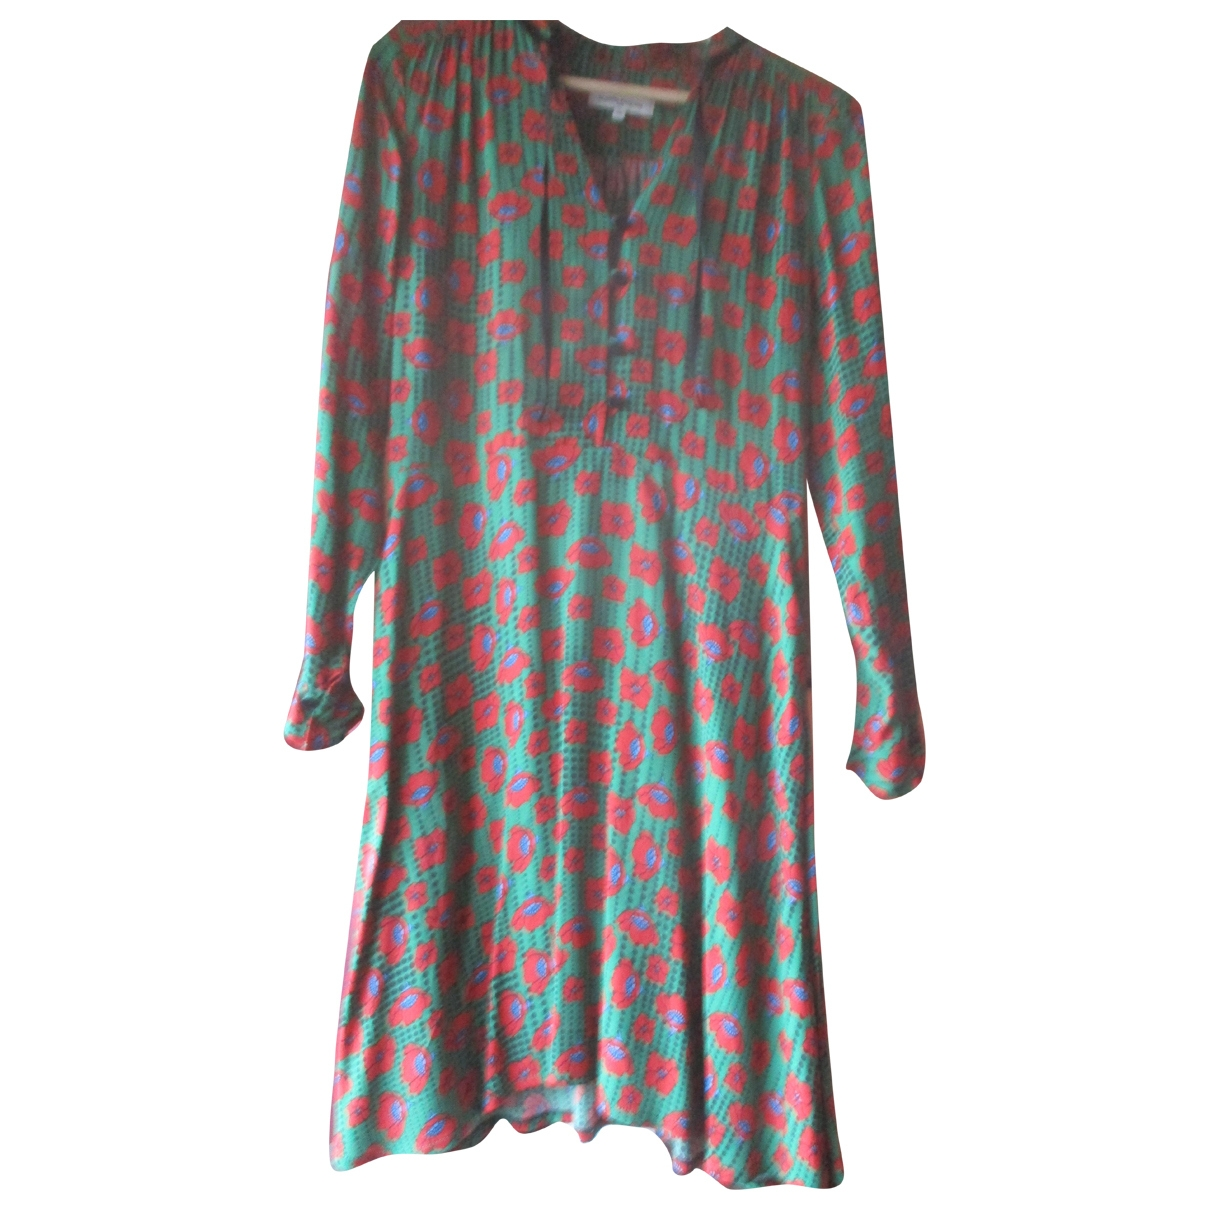 La Petite Francaise \N Green dress for Women 38 FR